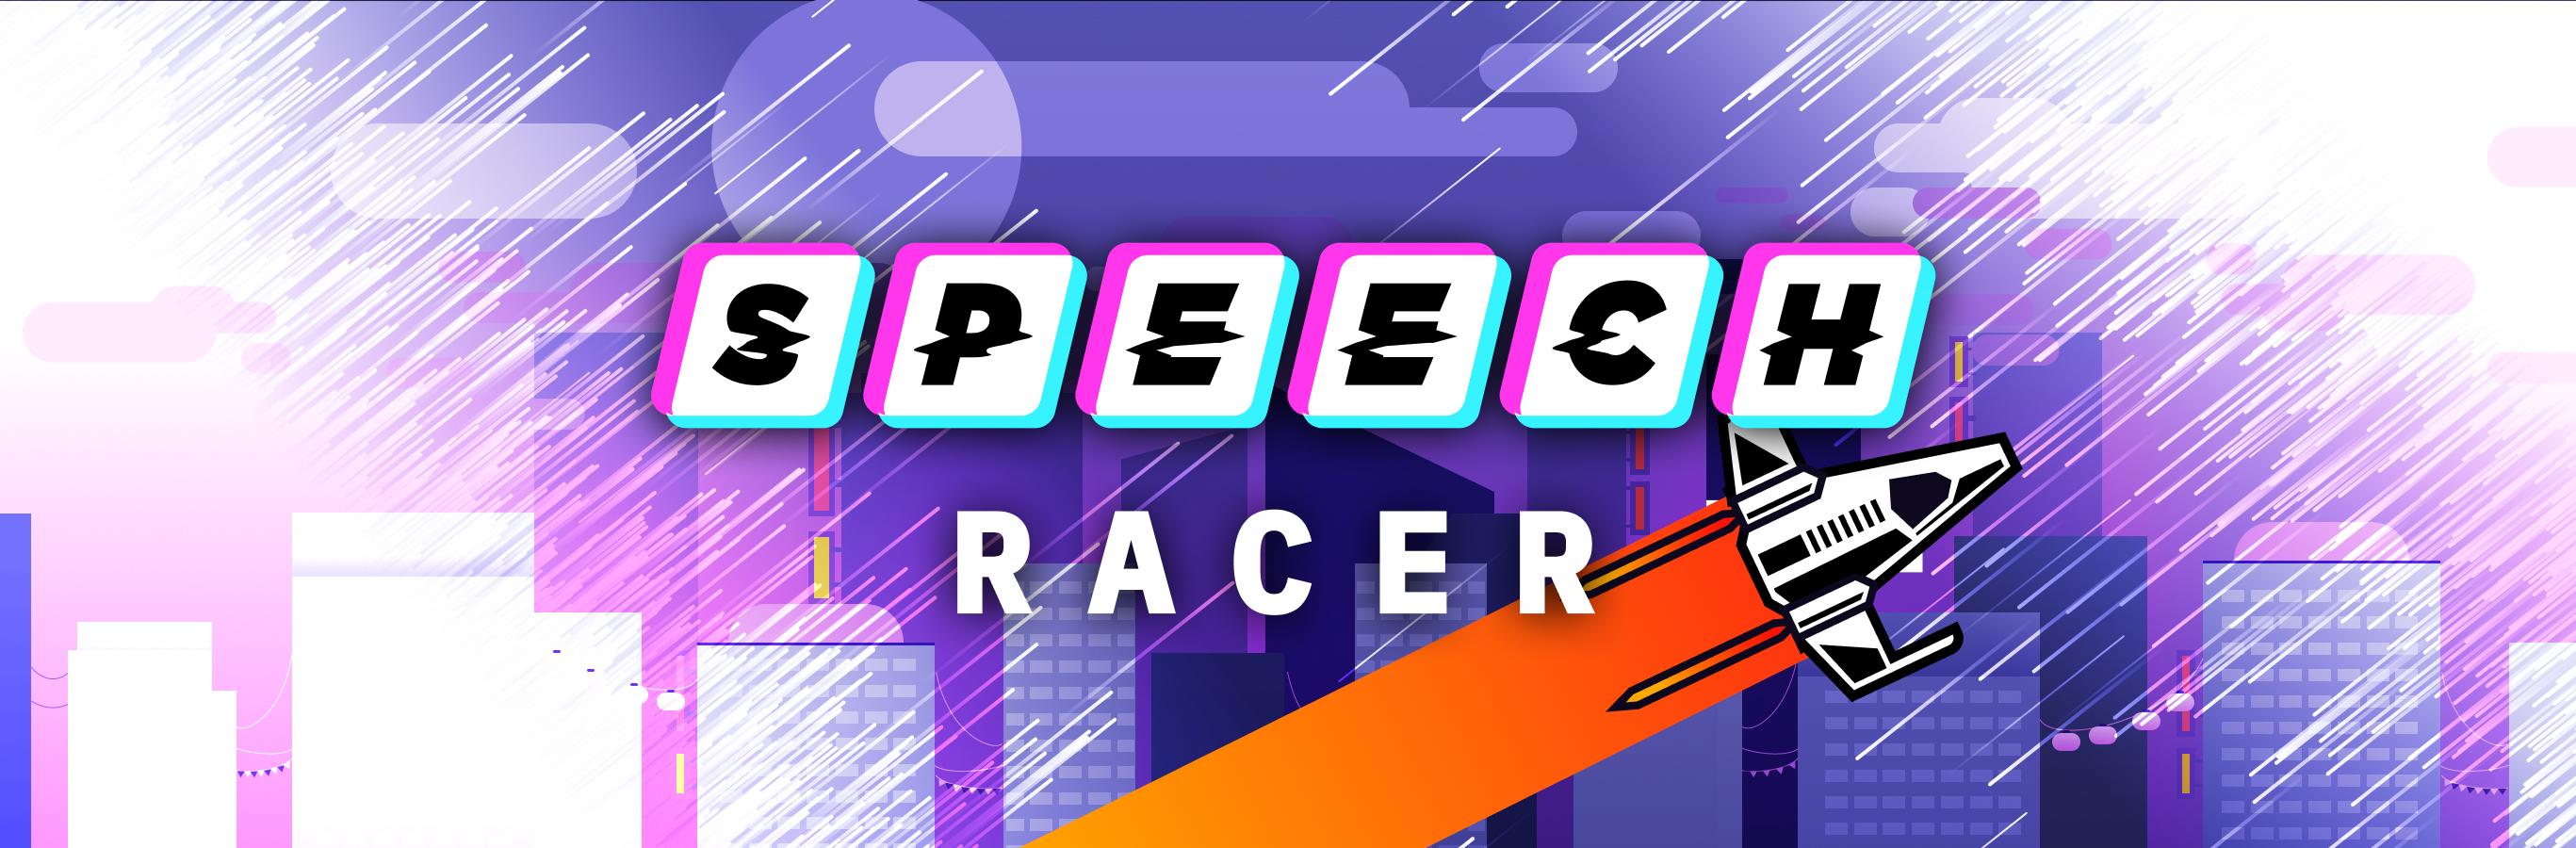 Speech Racer - Game Jam Version 🚀